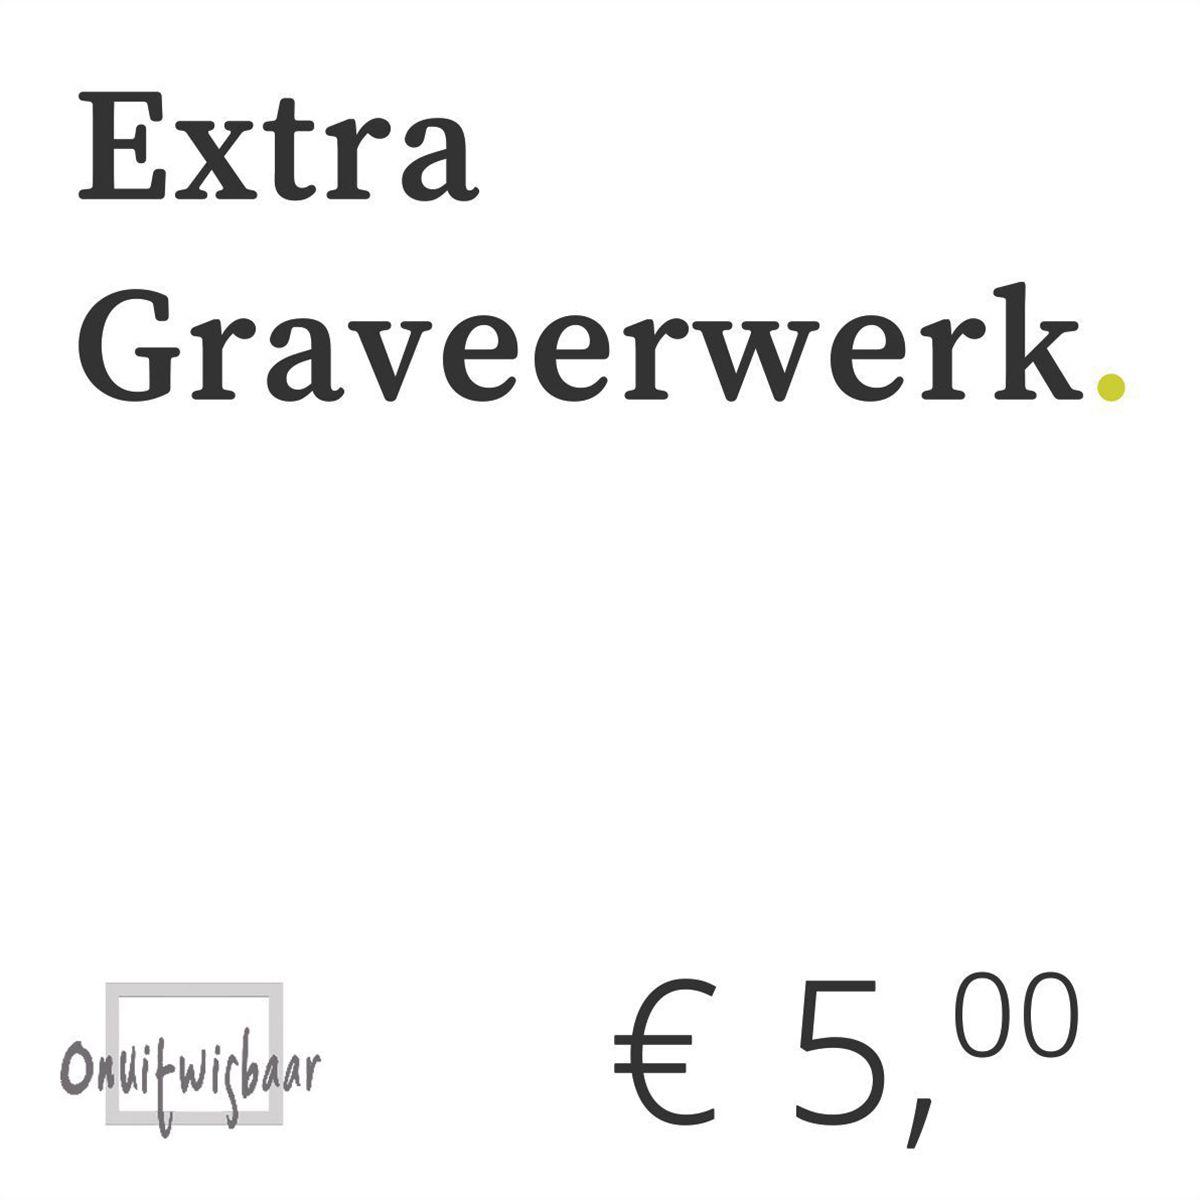 5 extra graveerwerk